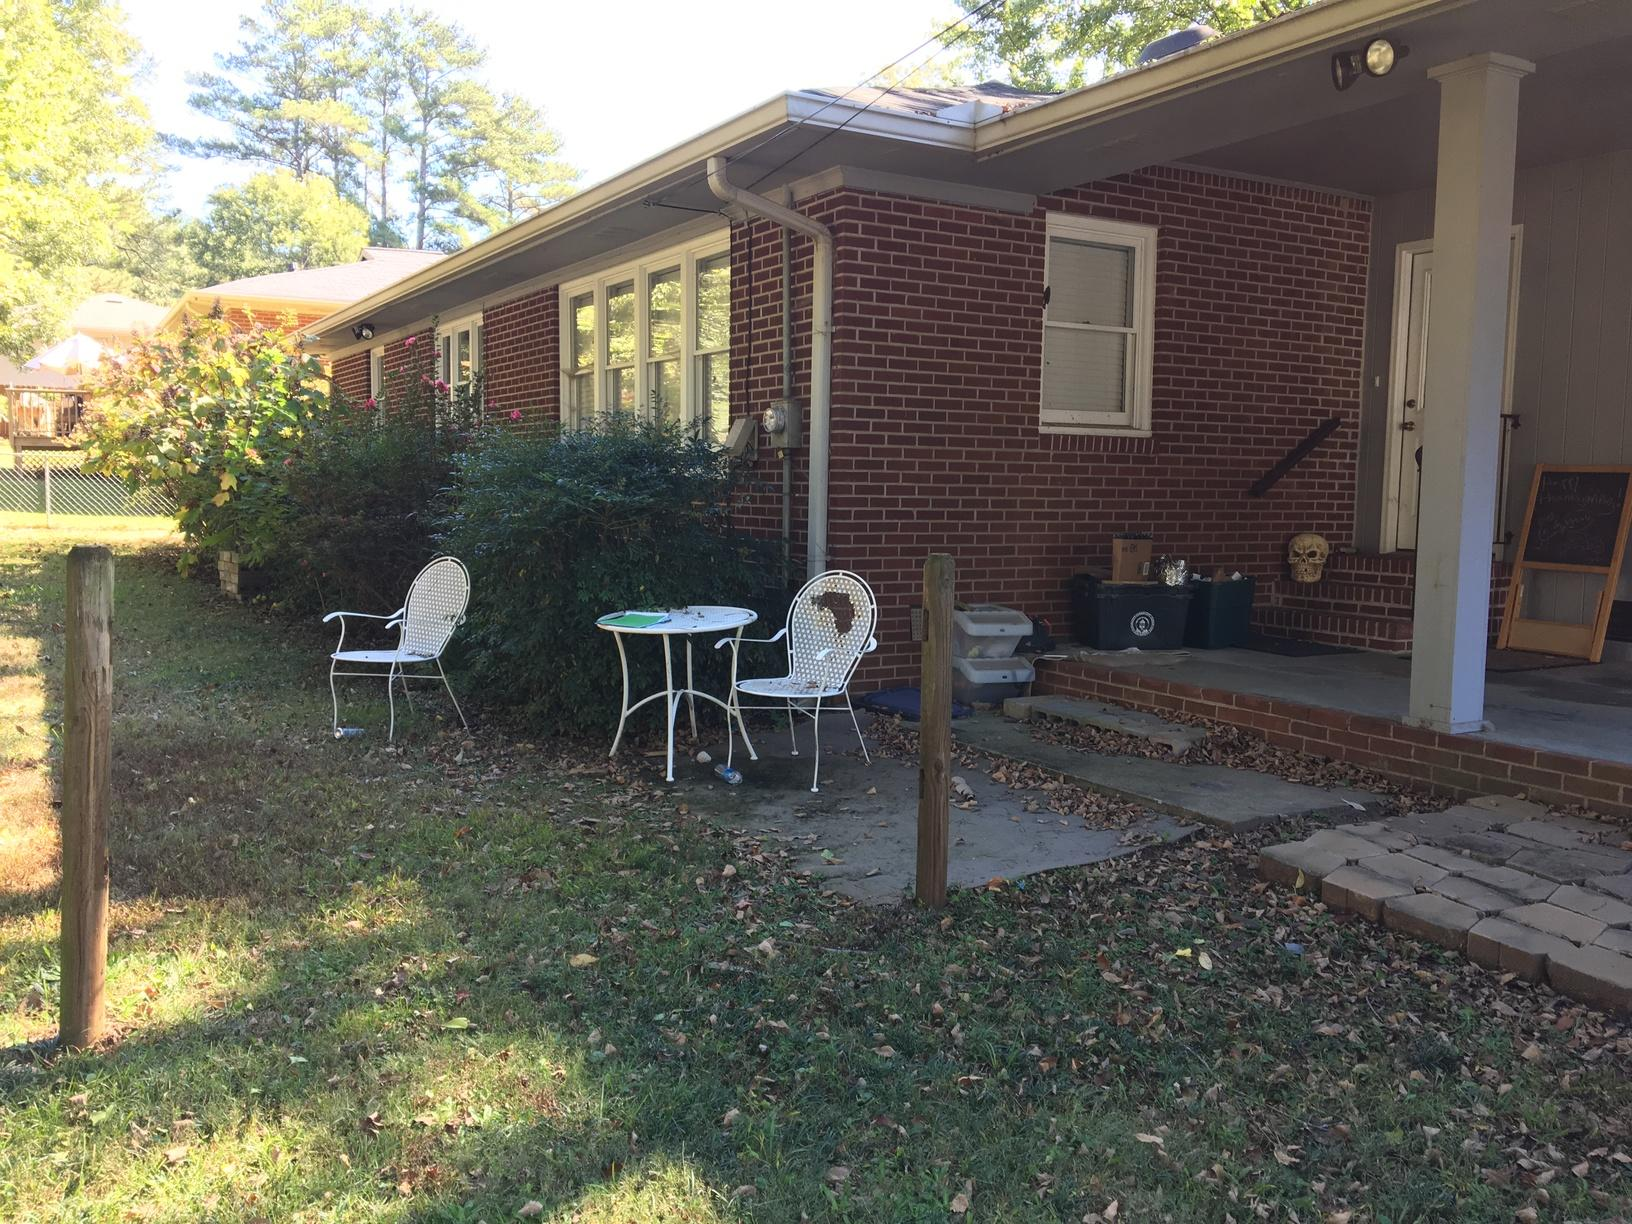 Homeowners Wanting to Update Back Yard Space in Marietta, GA - Before Photo